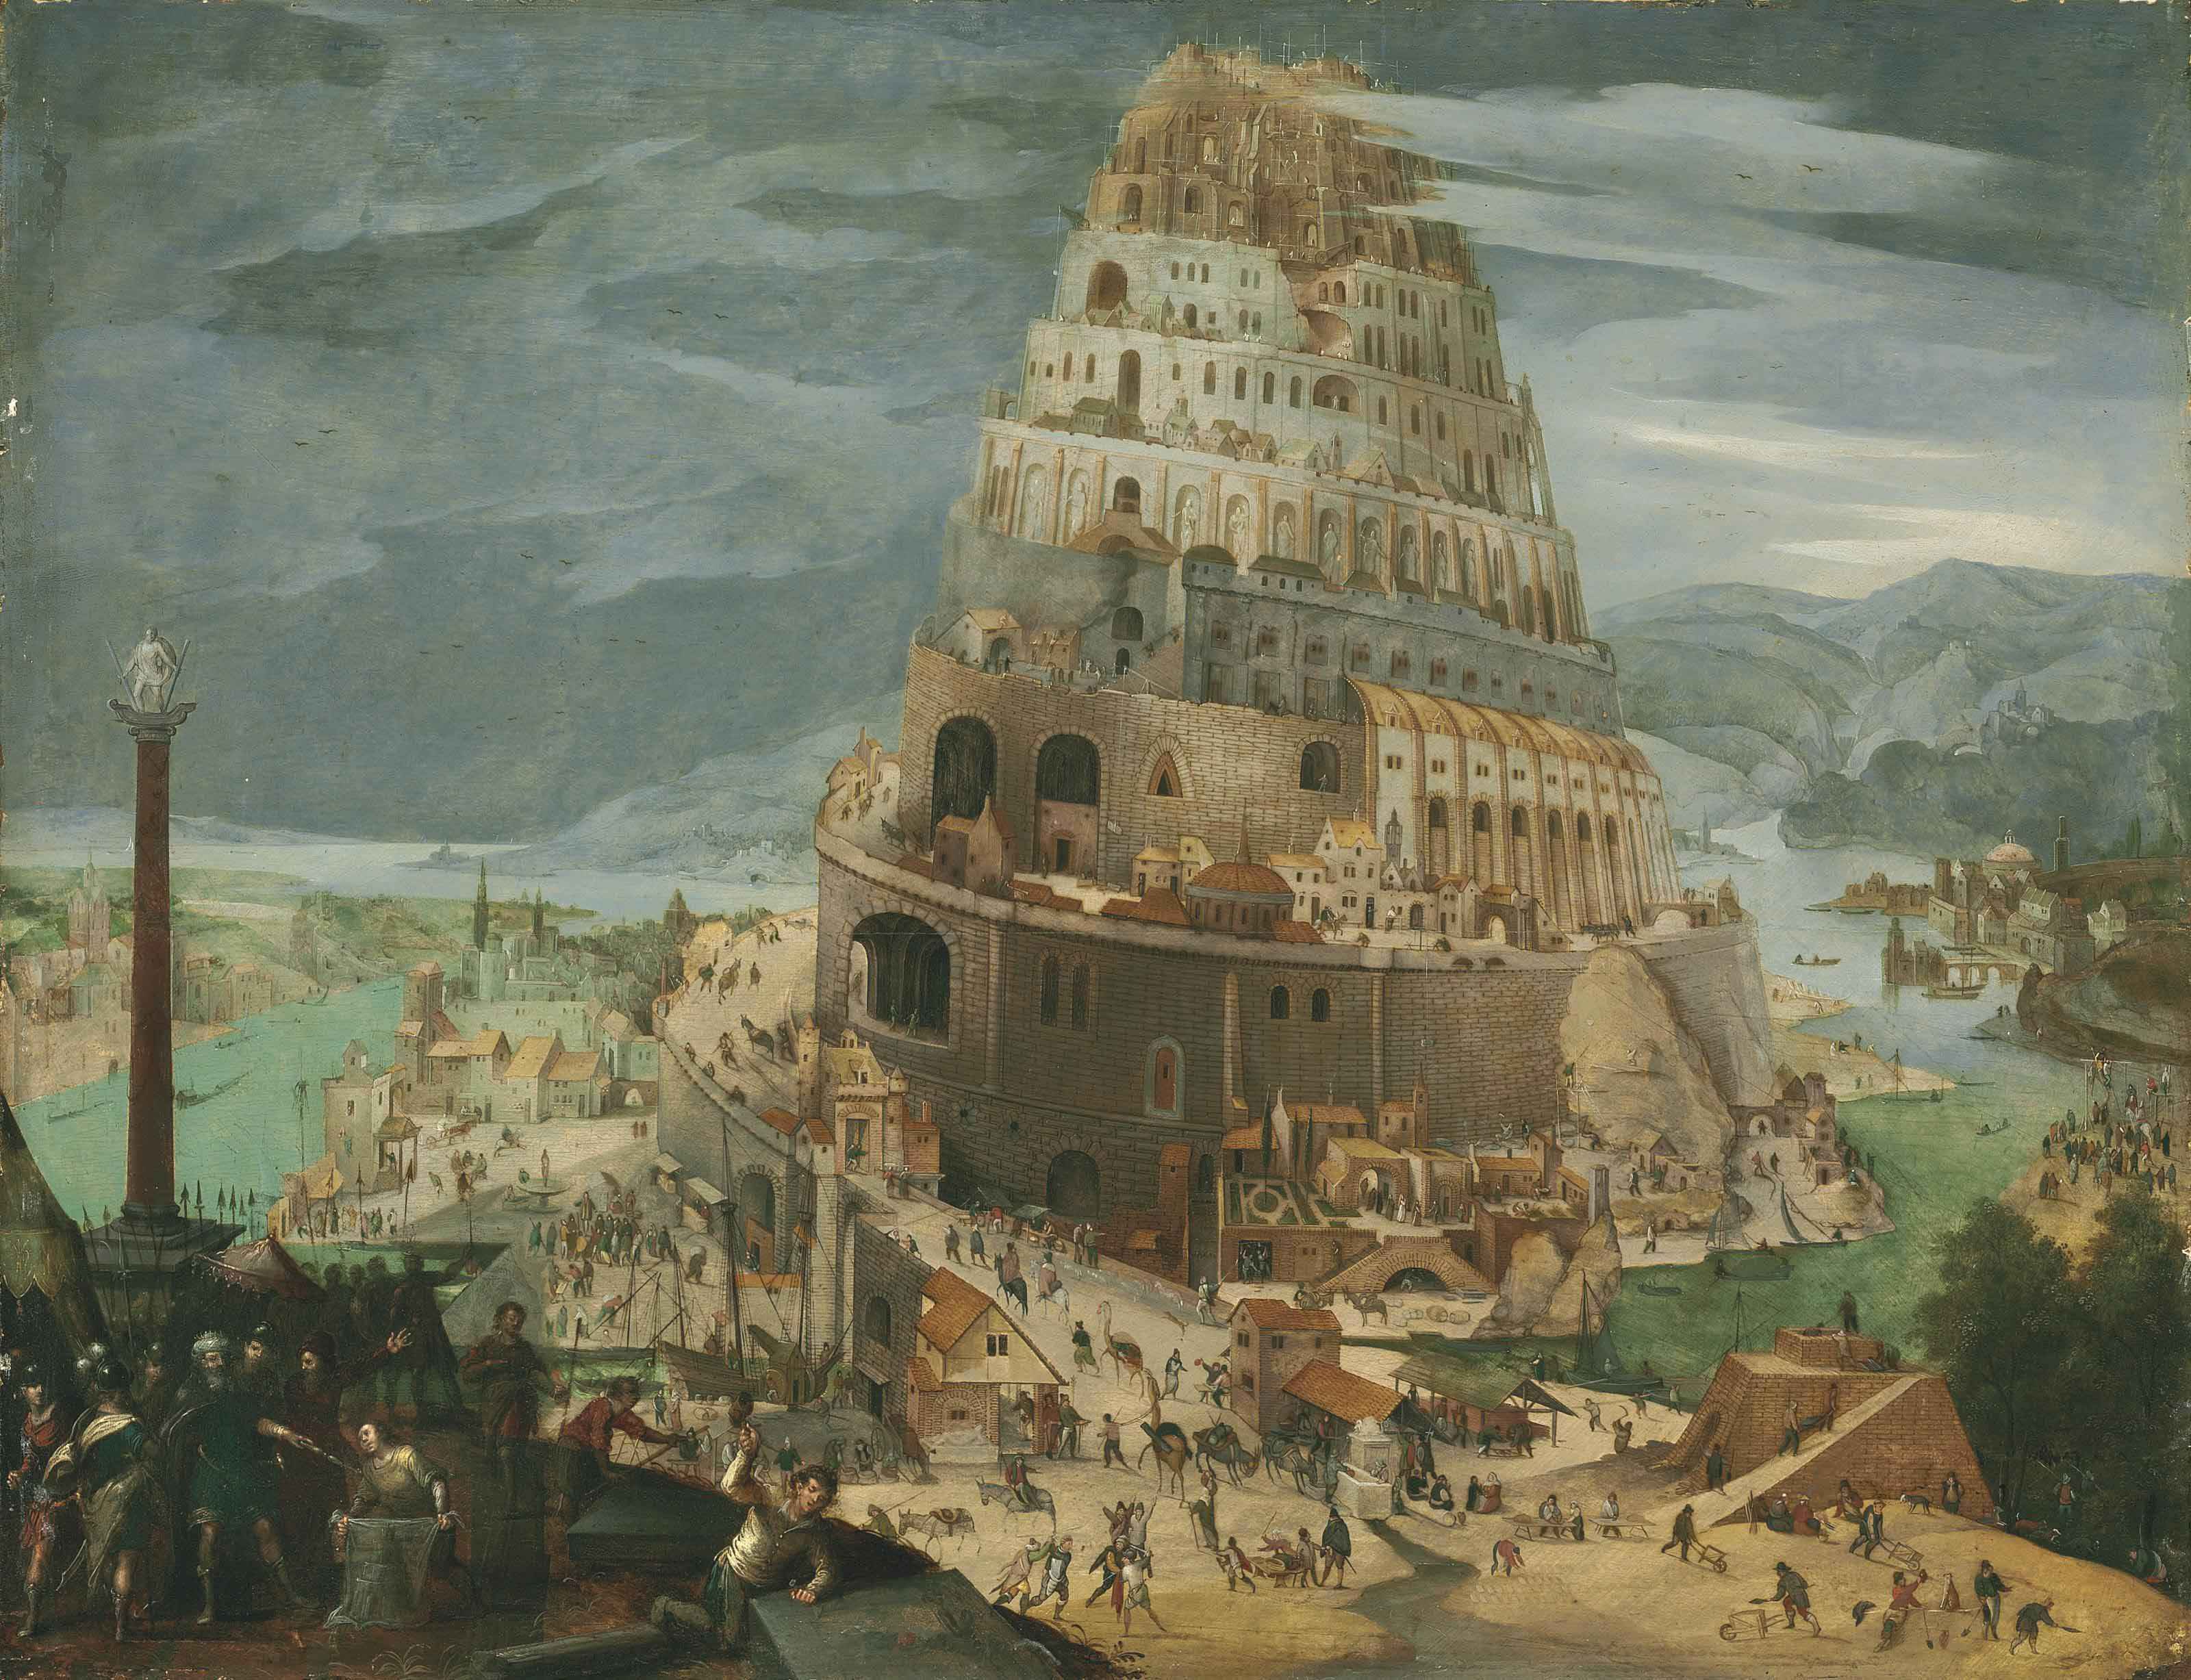 Abel Grimmer Antwerp 9 The Tower Of Babel